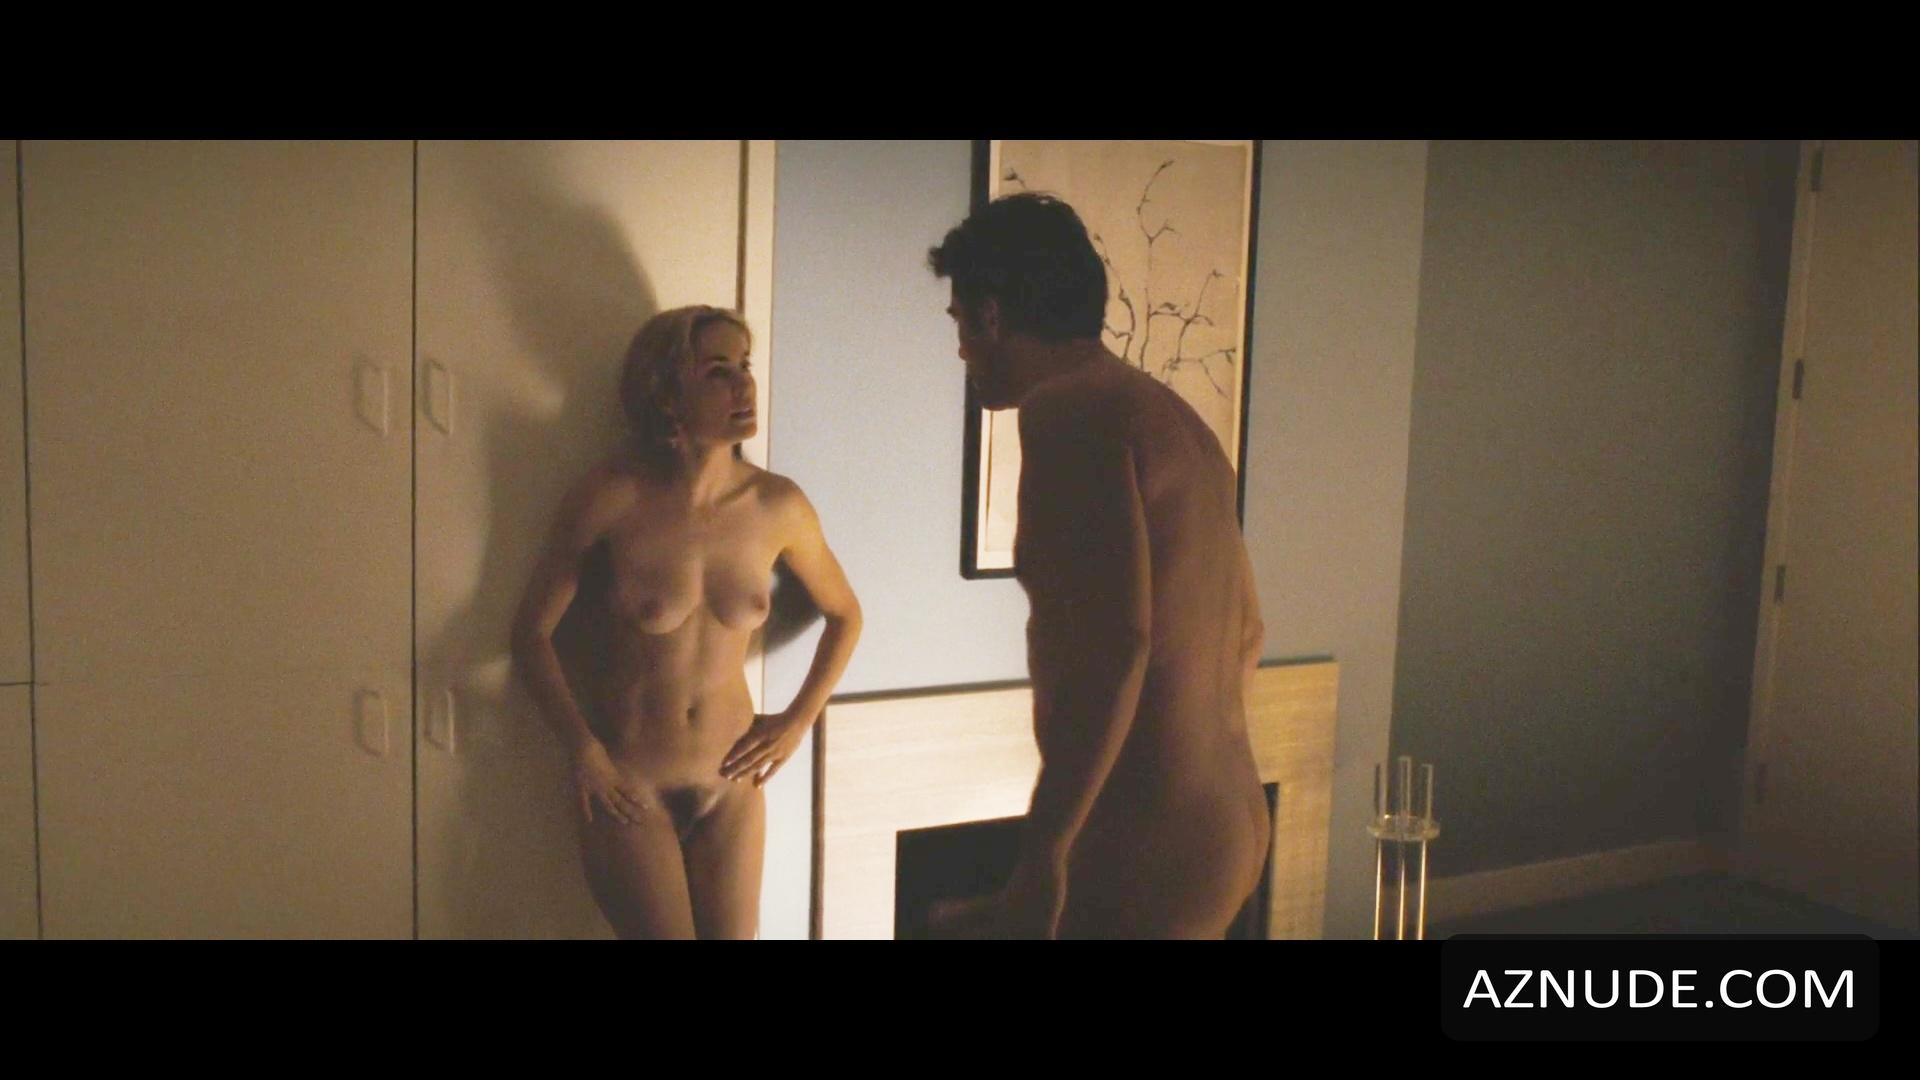 Naked Billy Burke Naked Pics